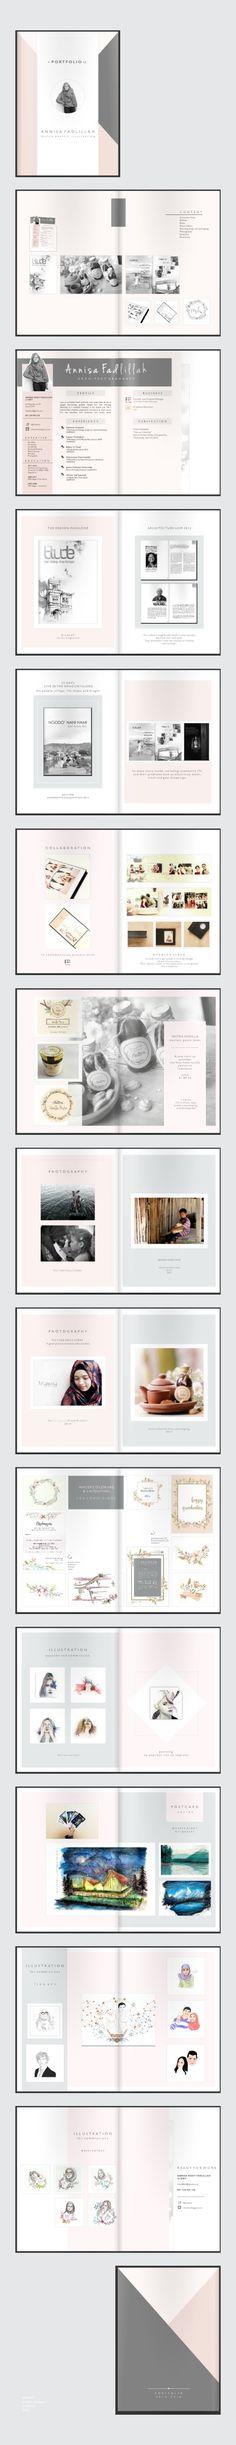 My Portfolio for graphic designer consist of design, illustration and artworks.